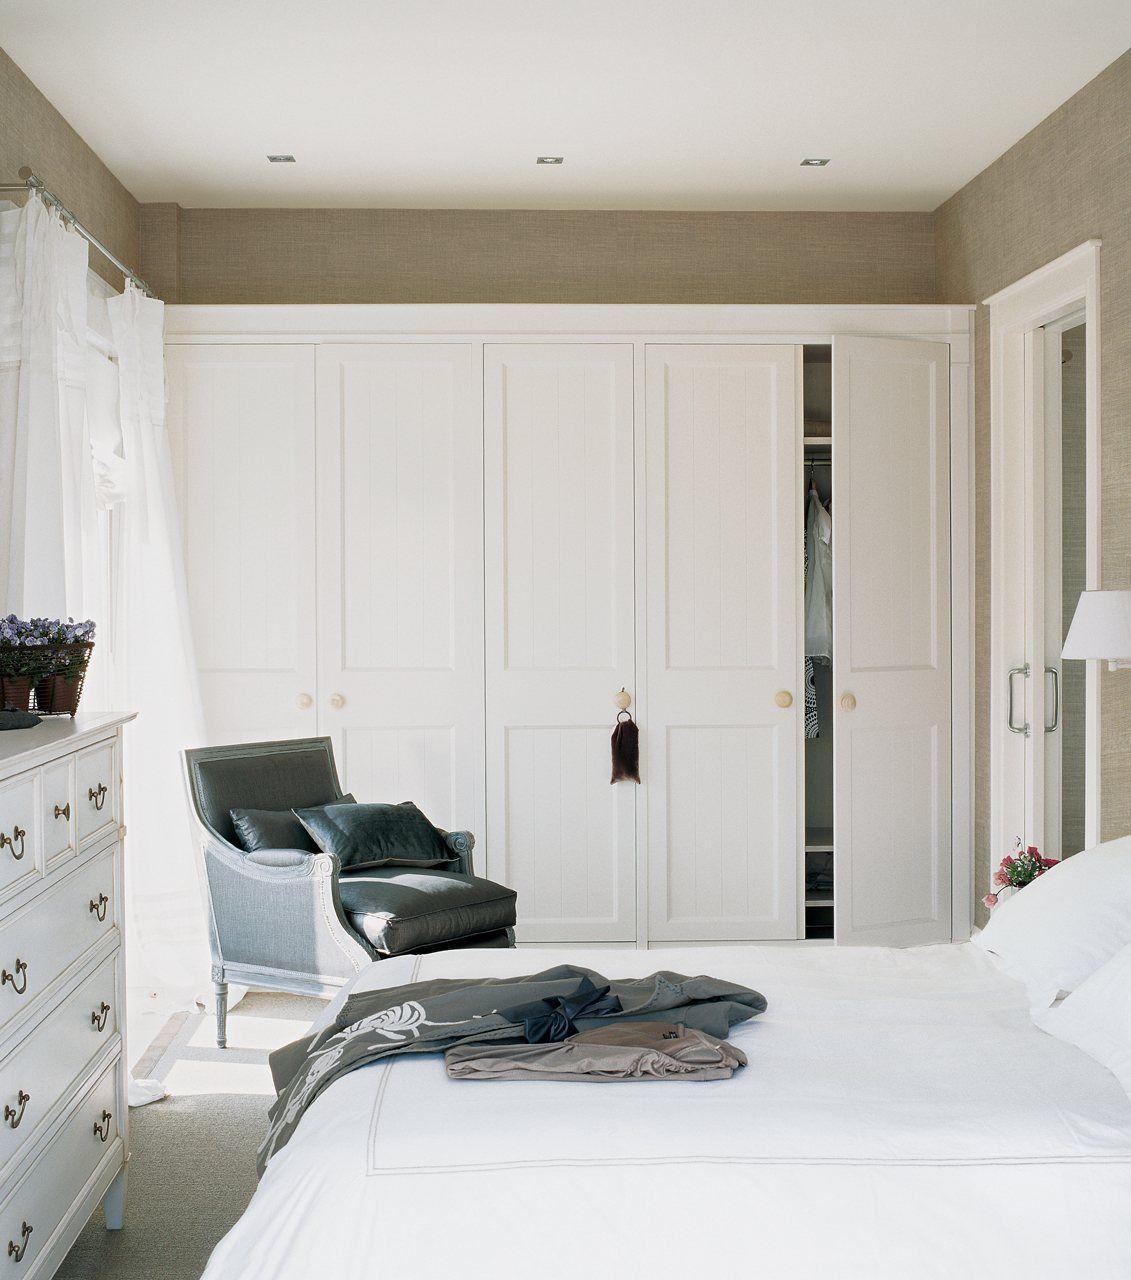 Dormitorios Peque Os Con Ideas Elmueble Com Dormitorios  ~ Decorar Dormitorio Matrimonio Pequeño